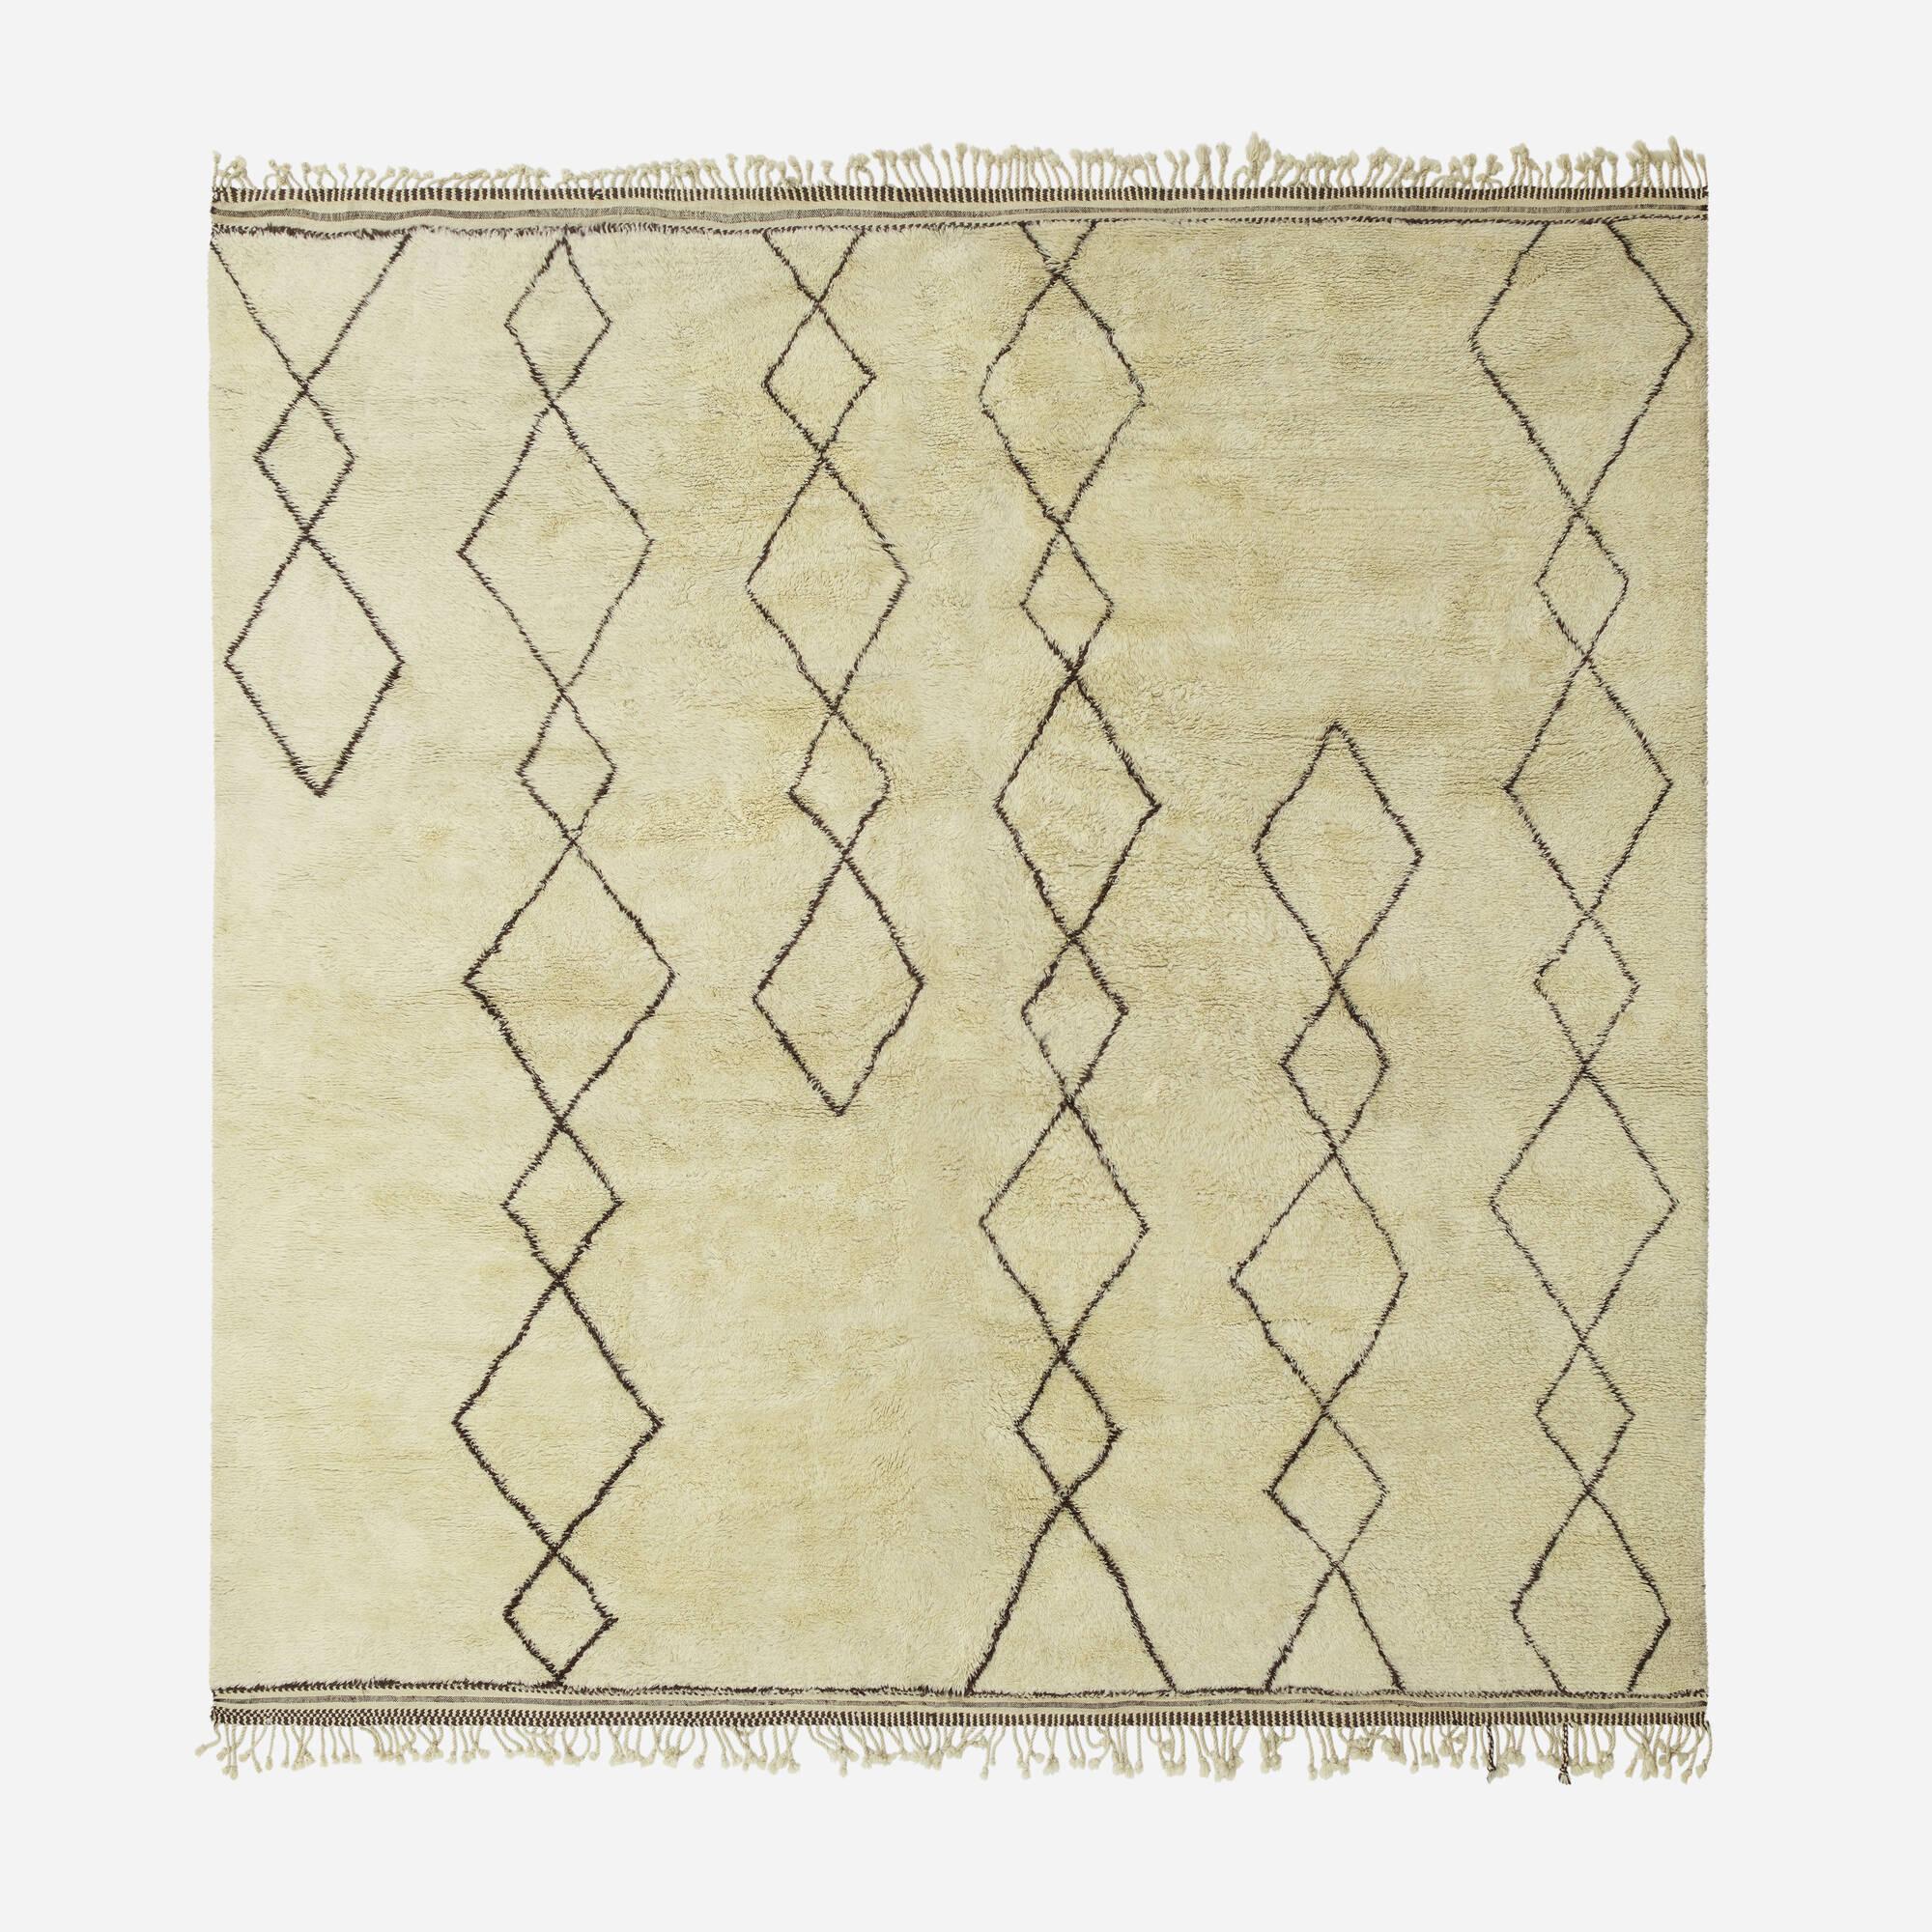 251: Moroccan / contemporary pile carpet (1 of 1)